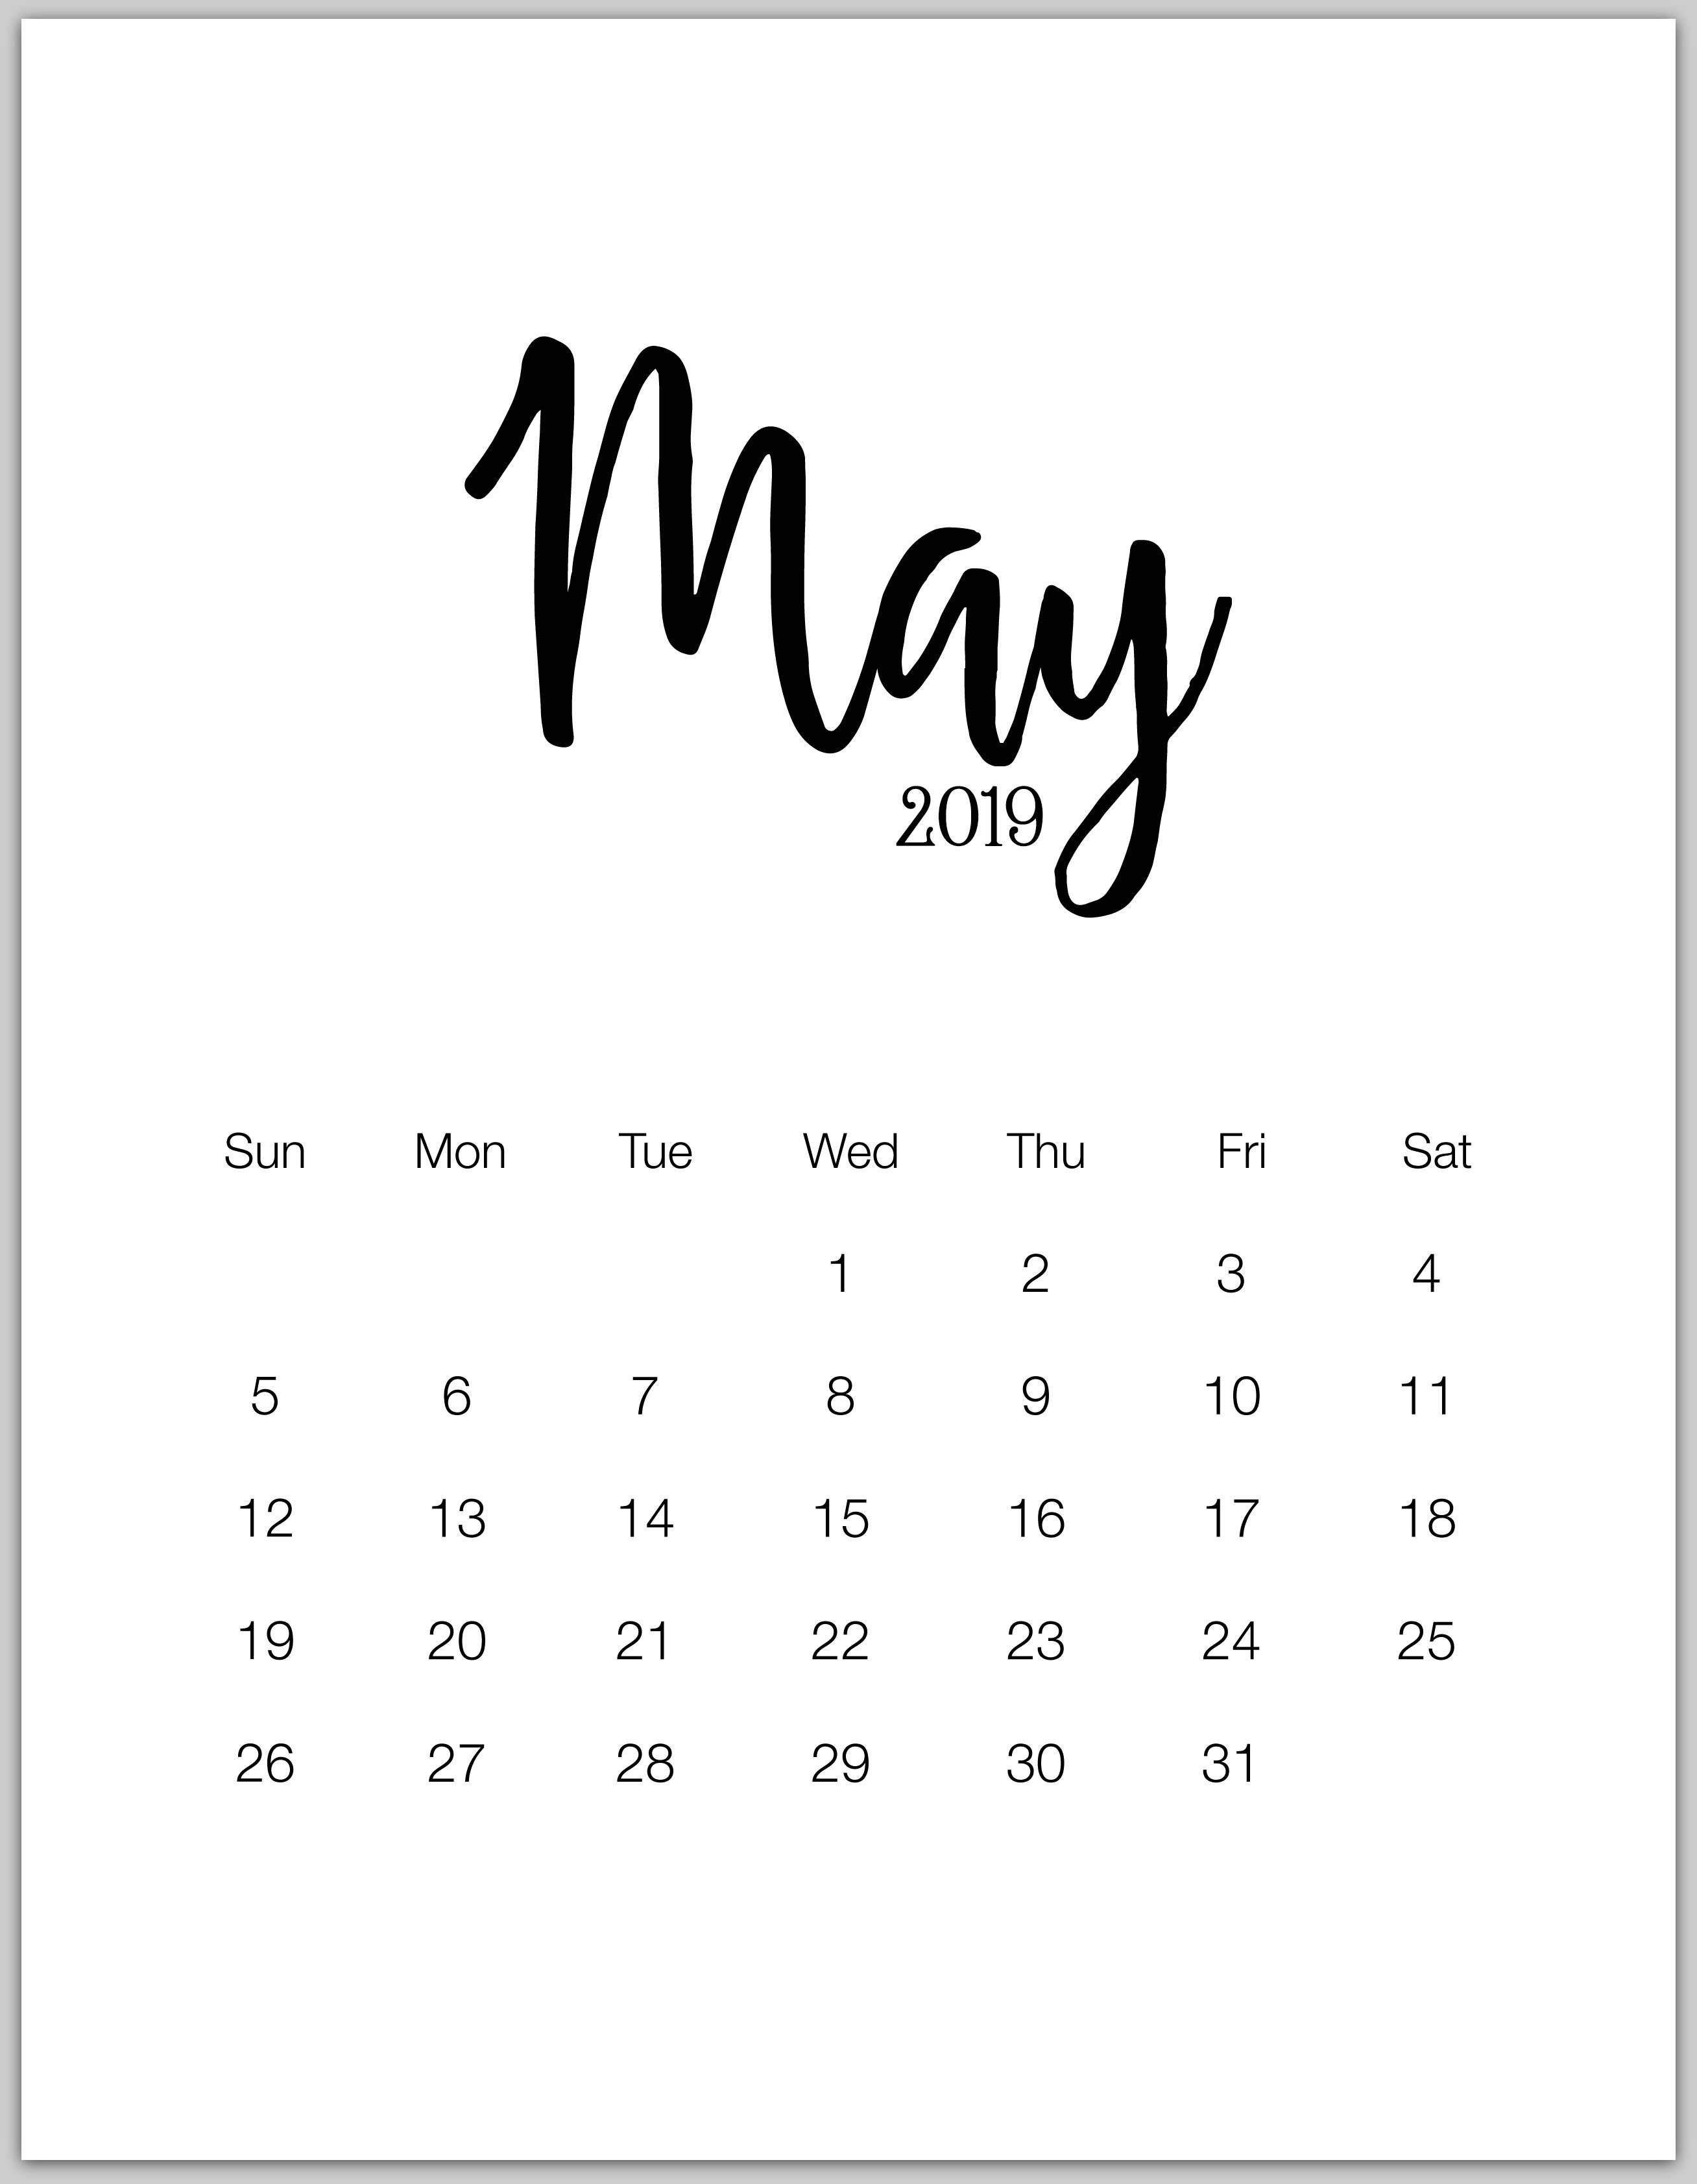 May 2019 Calendar Wallpapers – Wallpaper Cave May 8 2019 Calendar